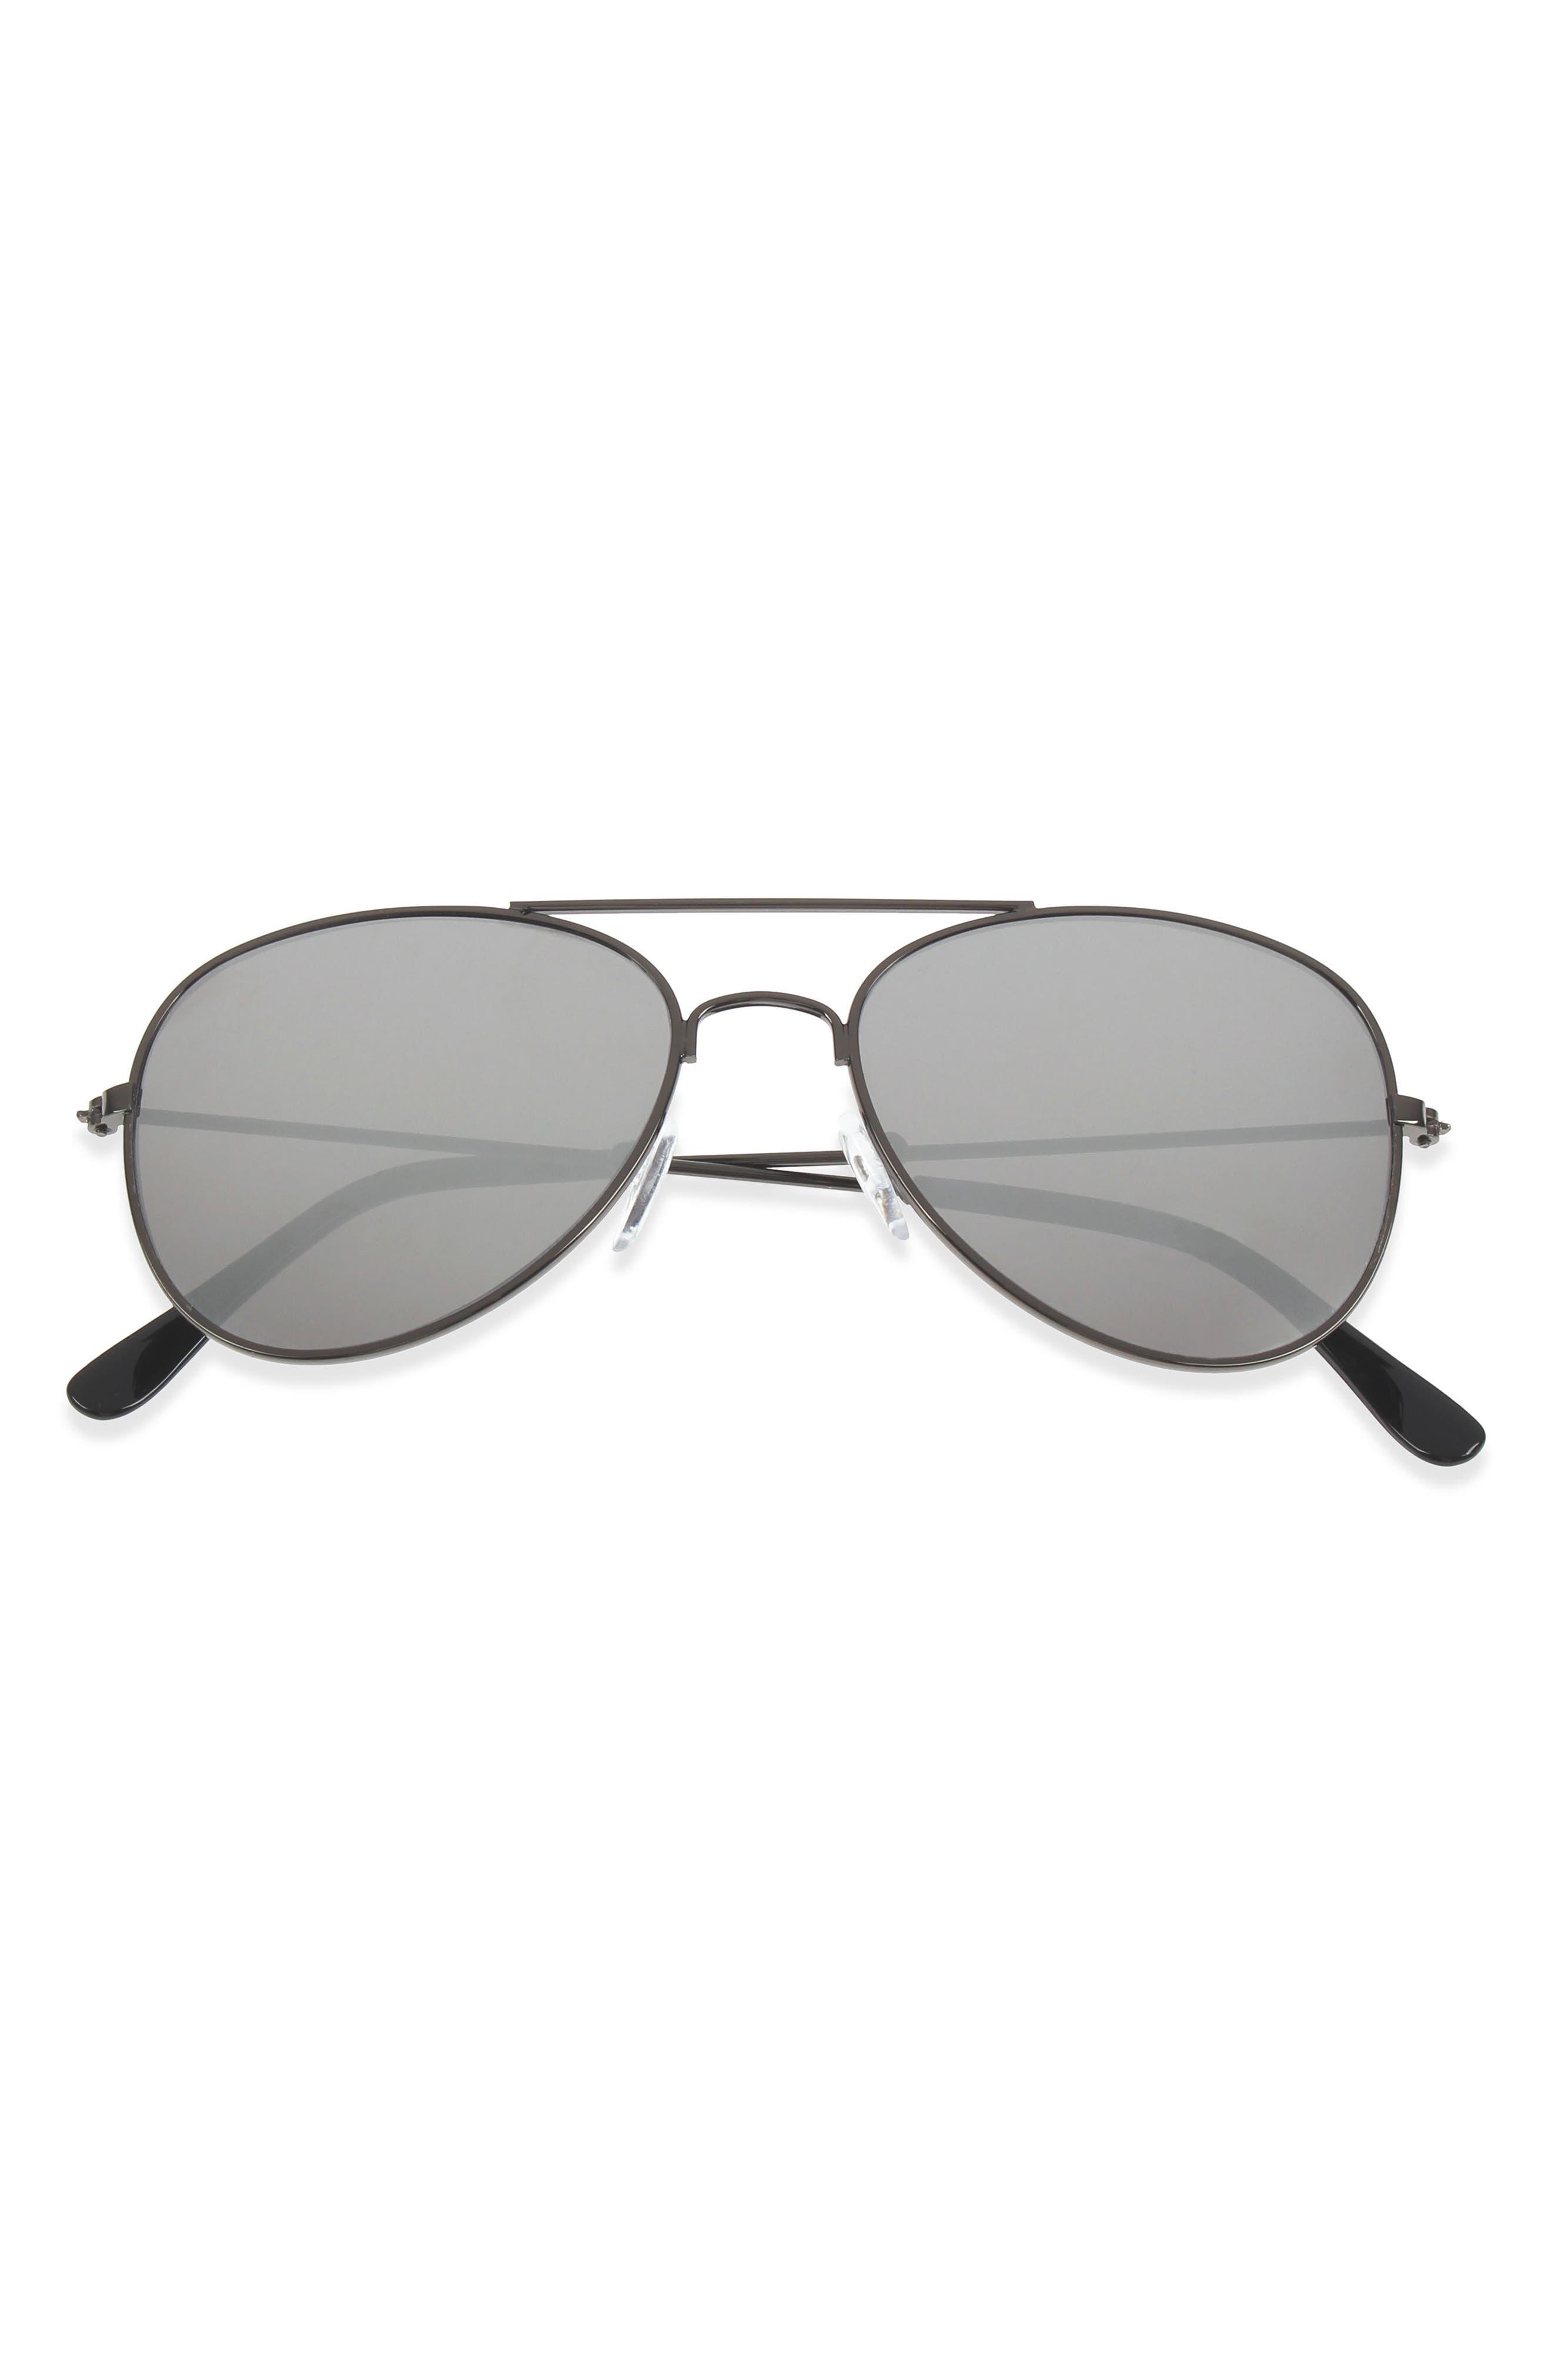 Capelli New York 50mm Mirrored Aviator Sunglasses (Little Boys)